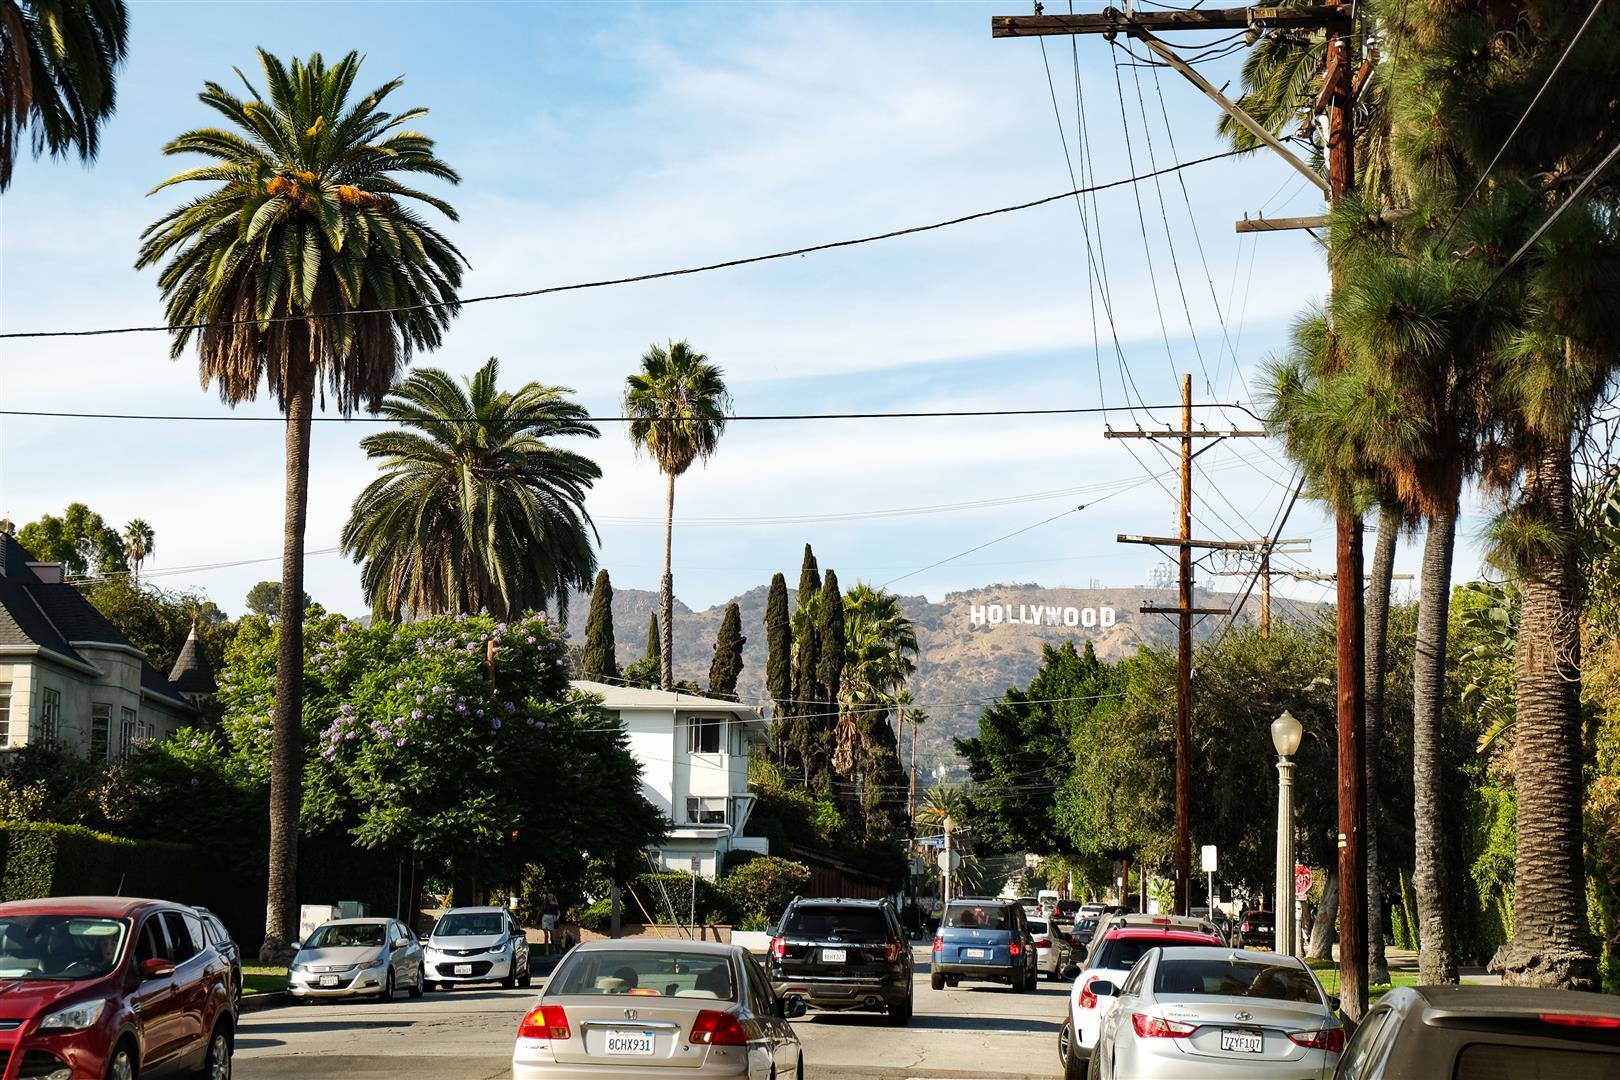 Hollywood Los Angeles (2)